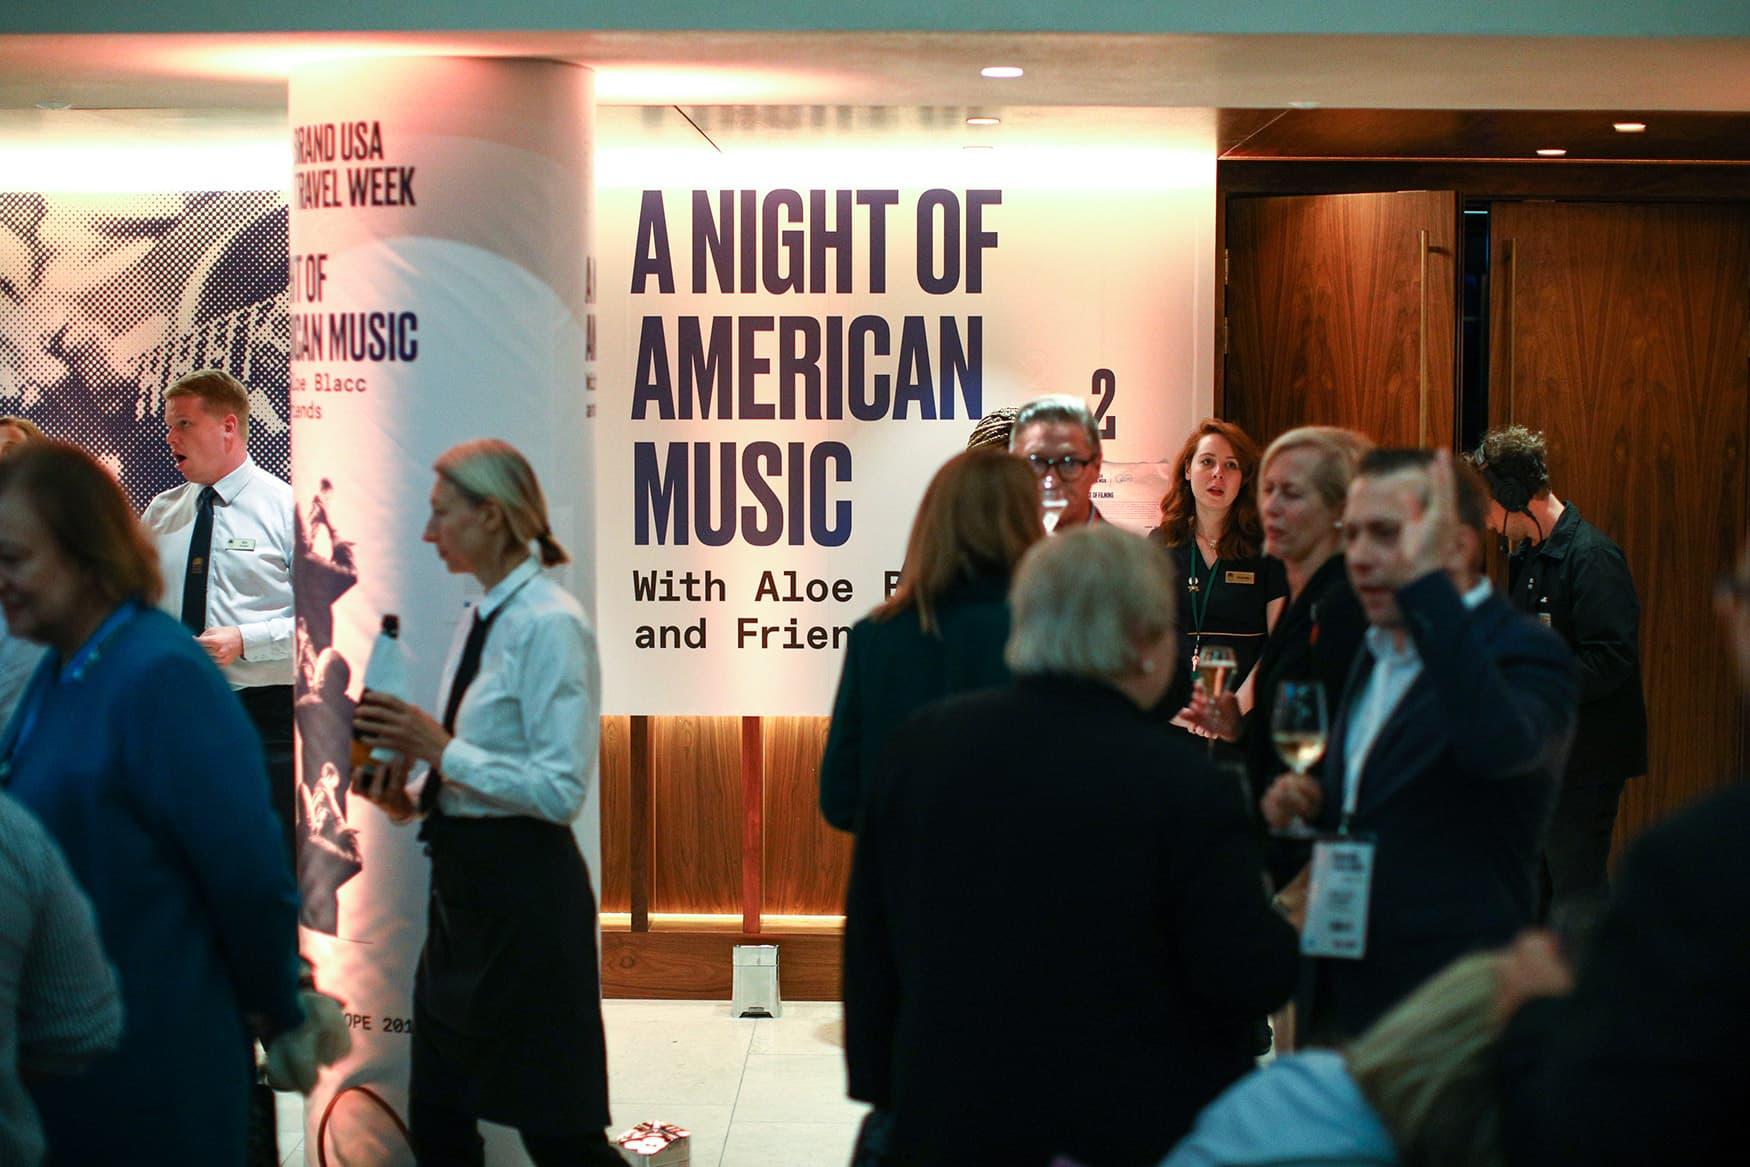 Brand-USA-Travel_Week-Opera-Hall-2-Citizen